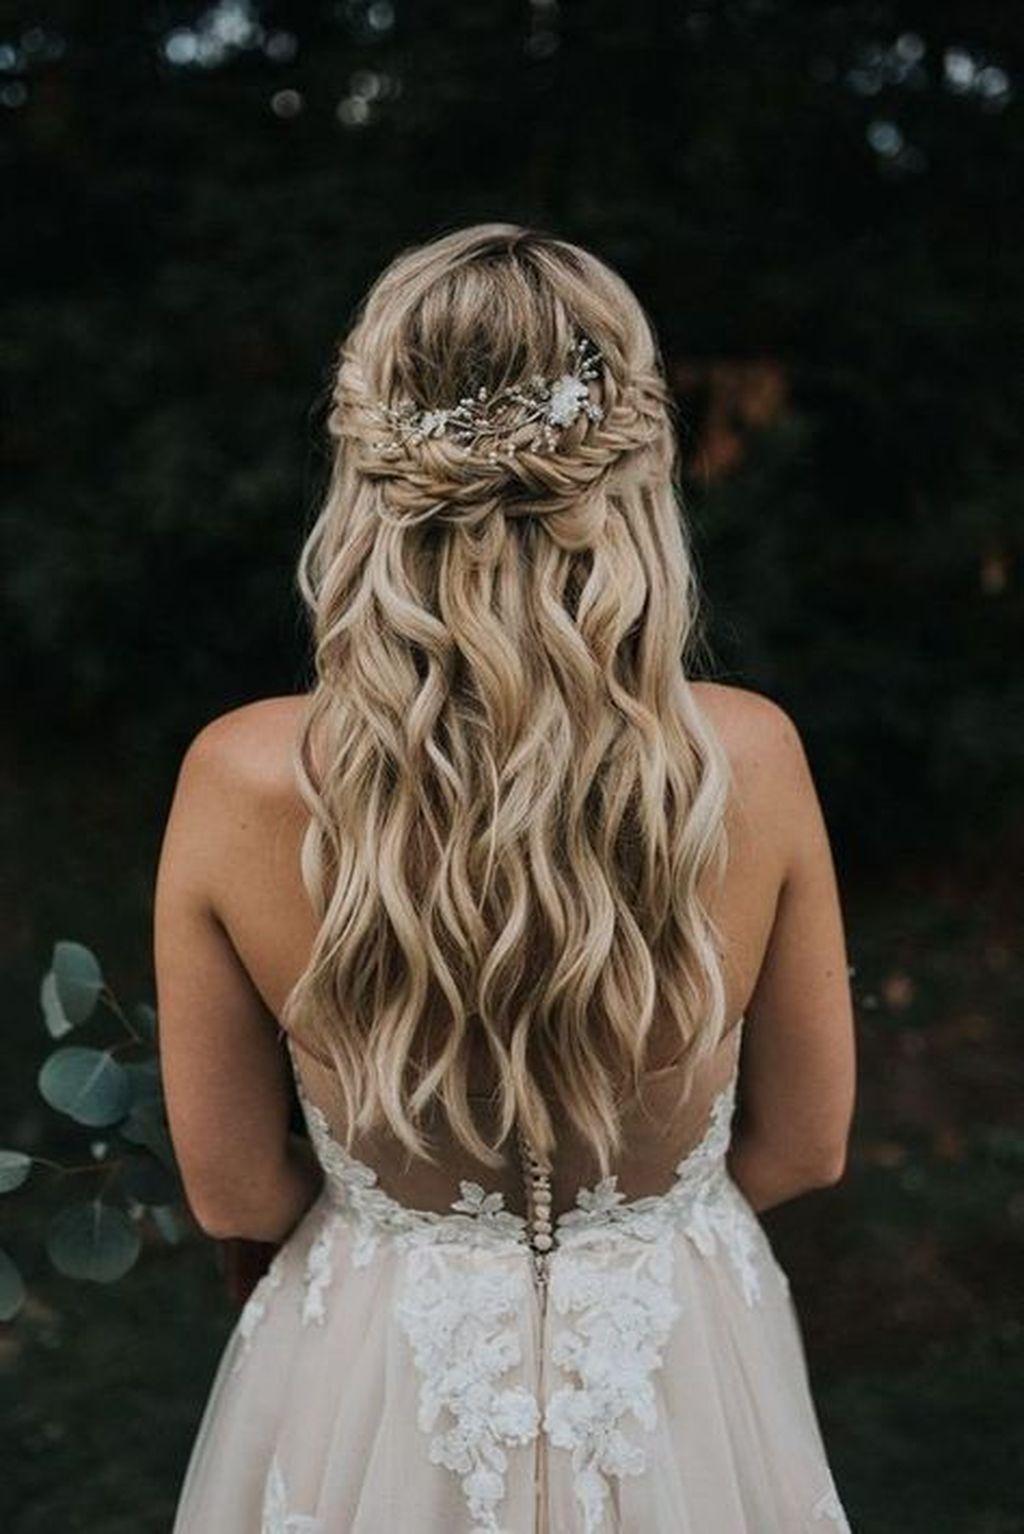 37 Delightful Wedding Hairstyles Ideas #hairstyleideas